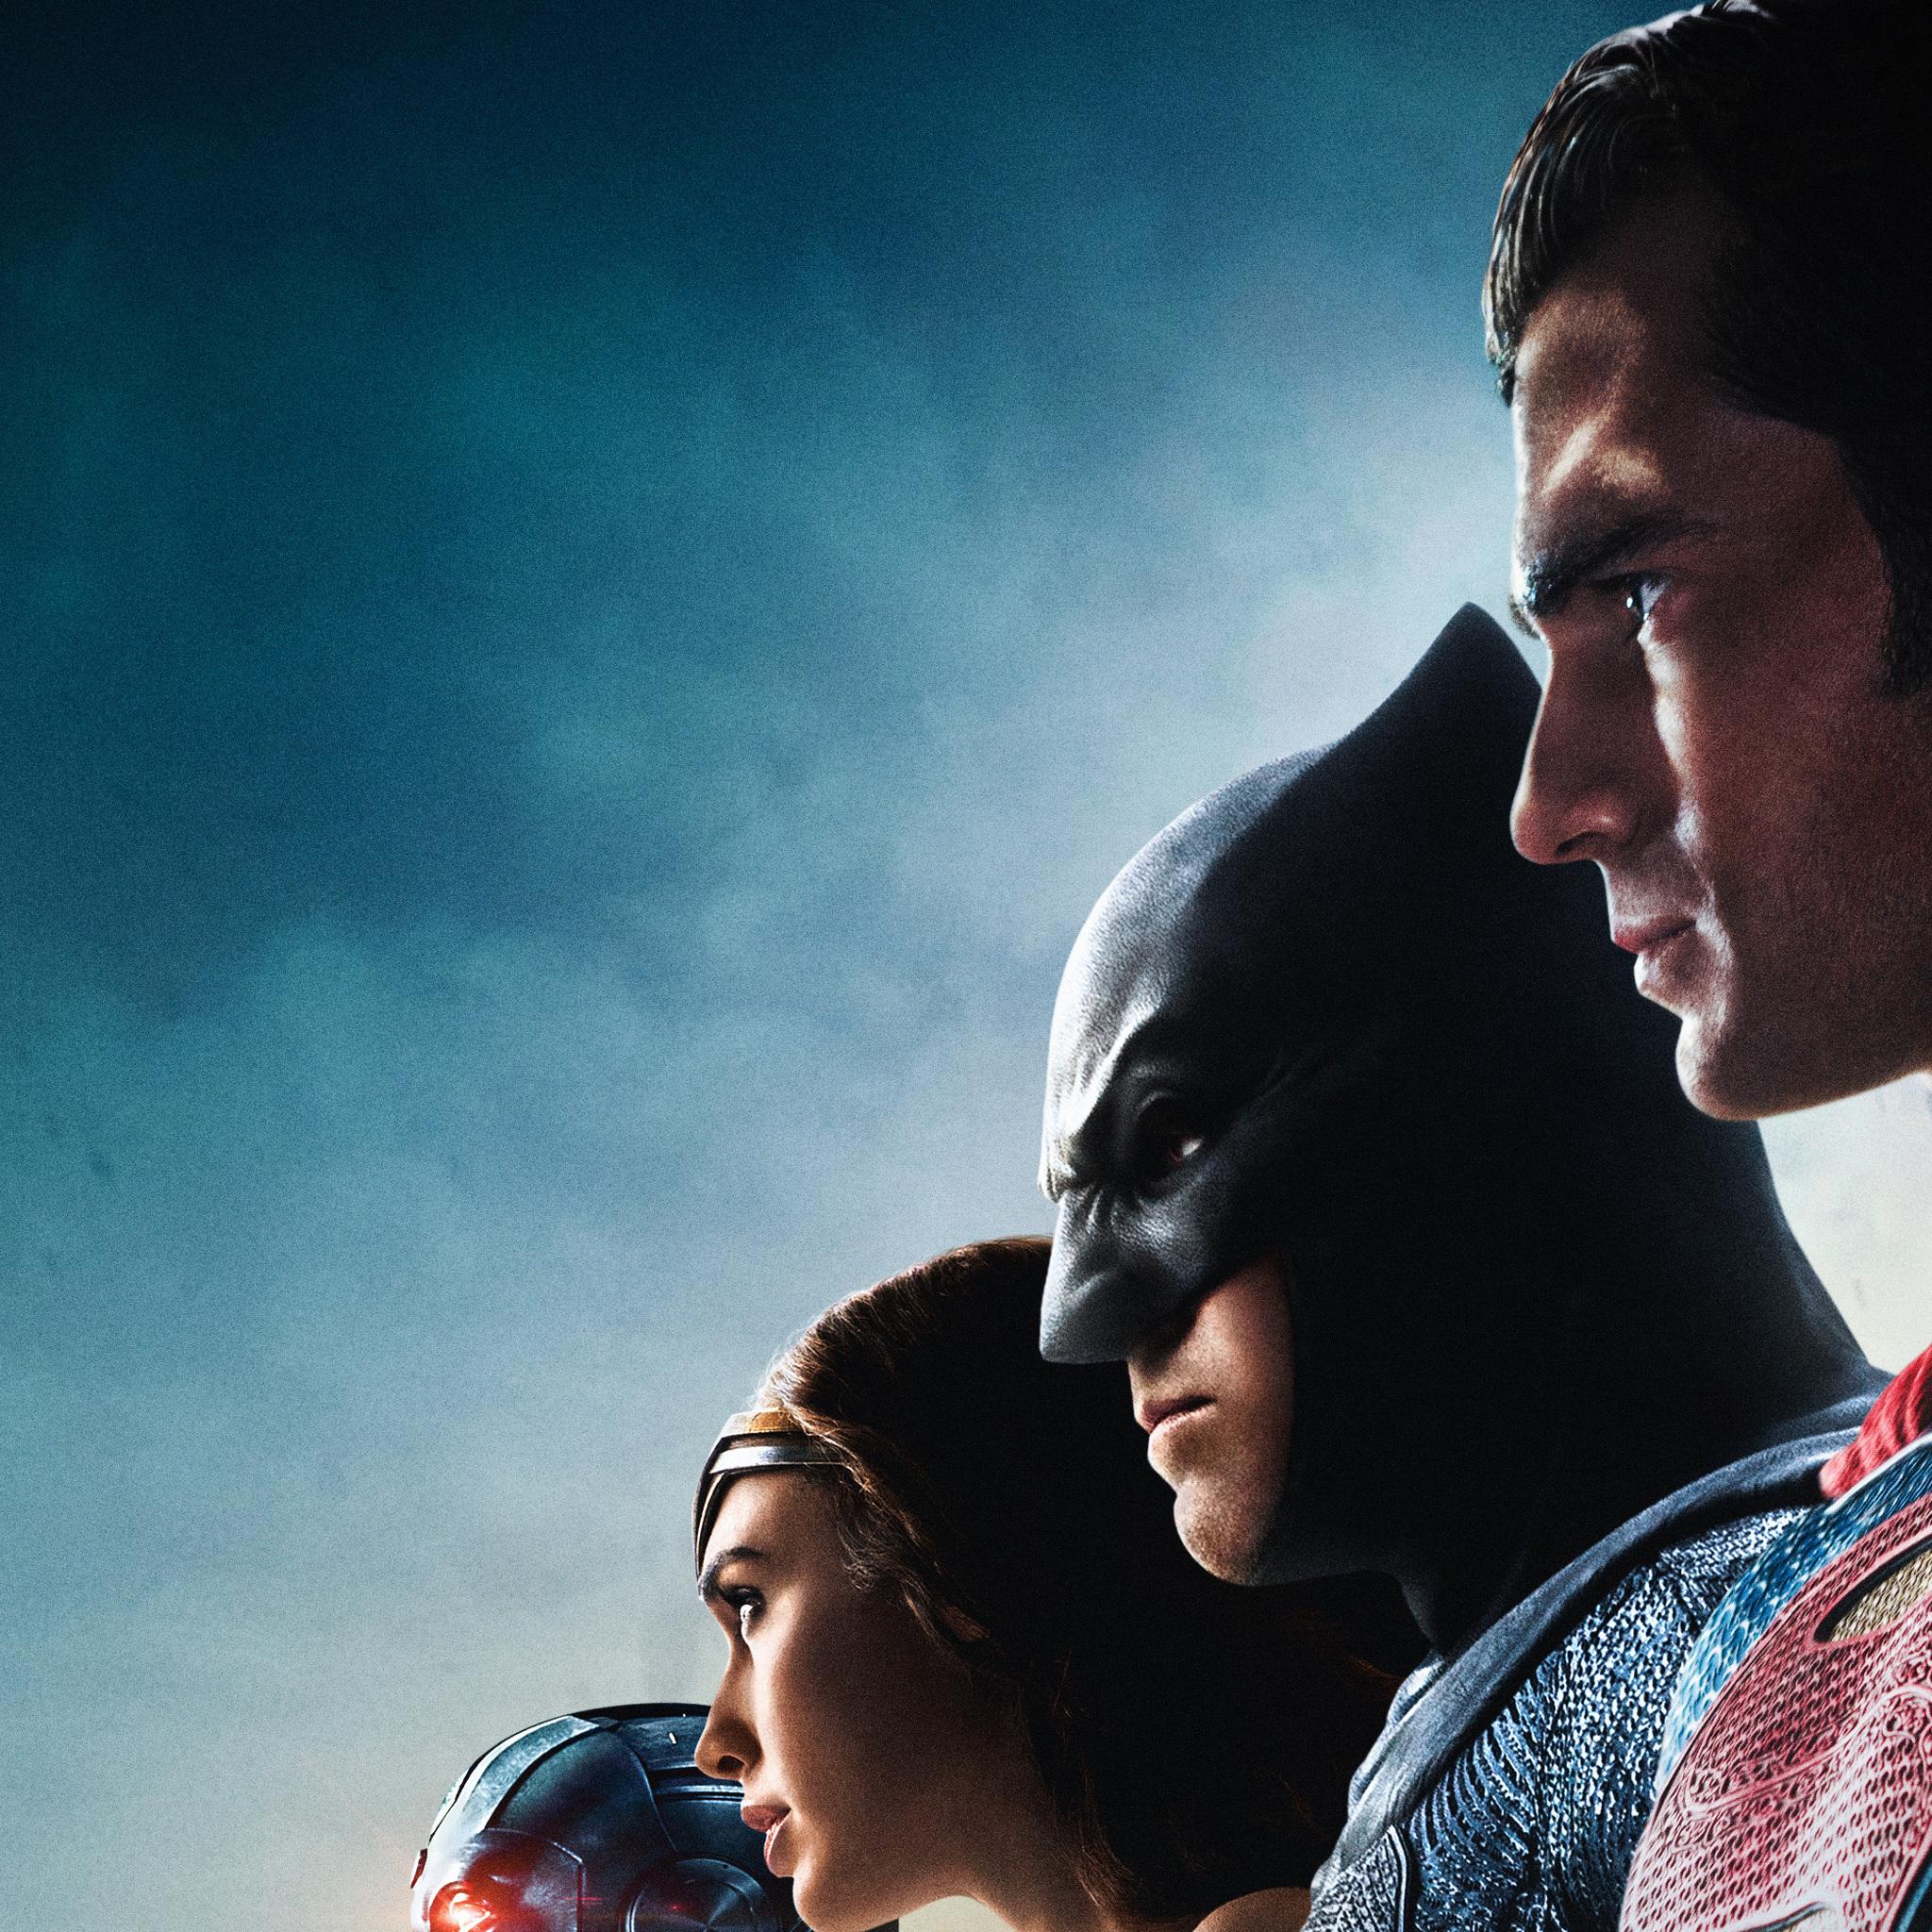 superman-batman-wonder-woman-justice-league-4k-7s.jpg